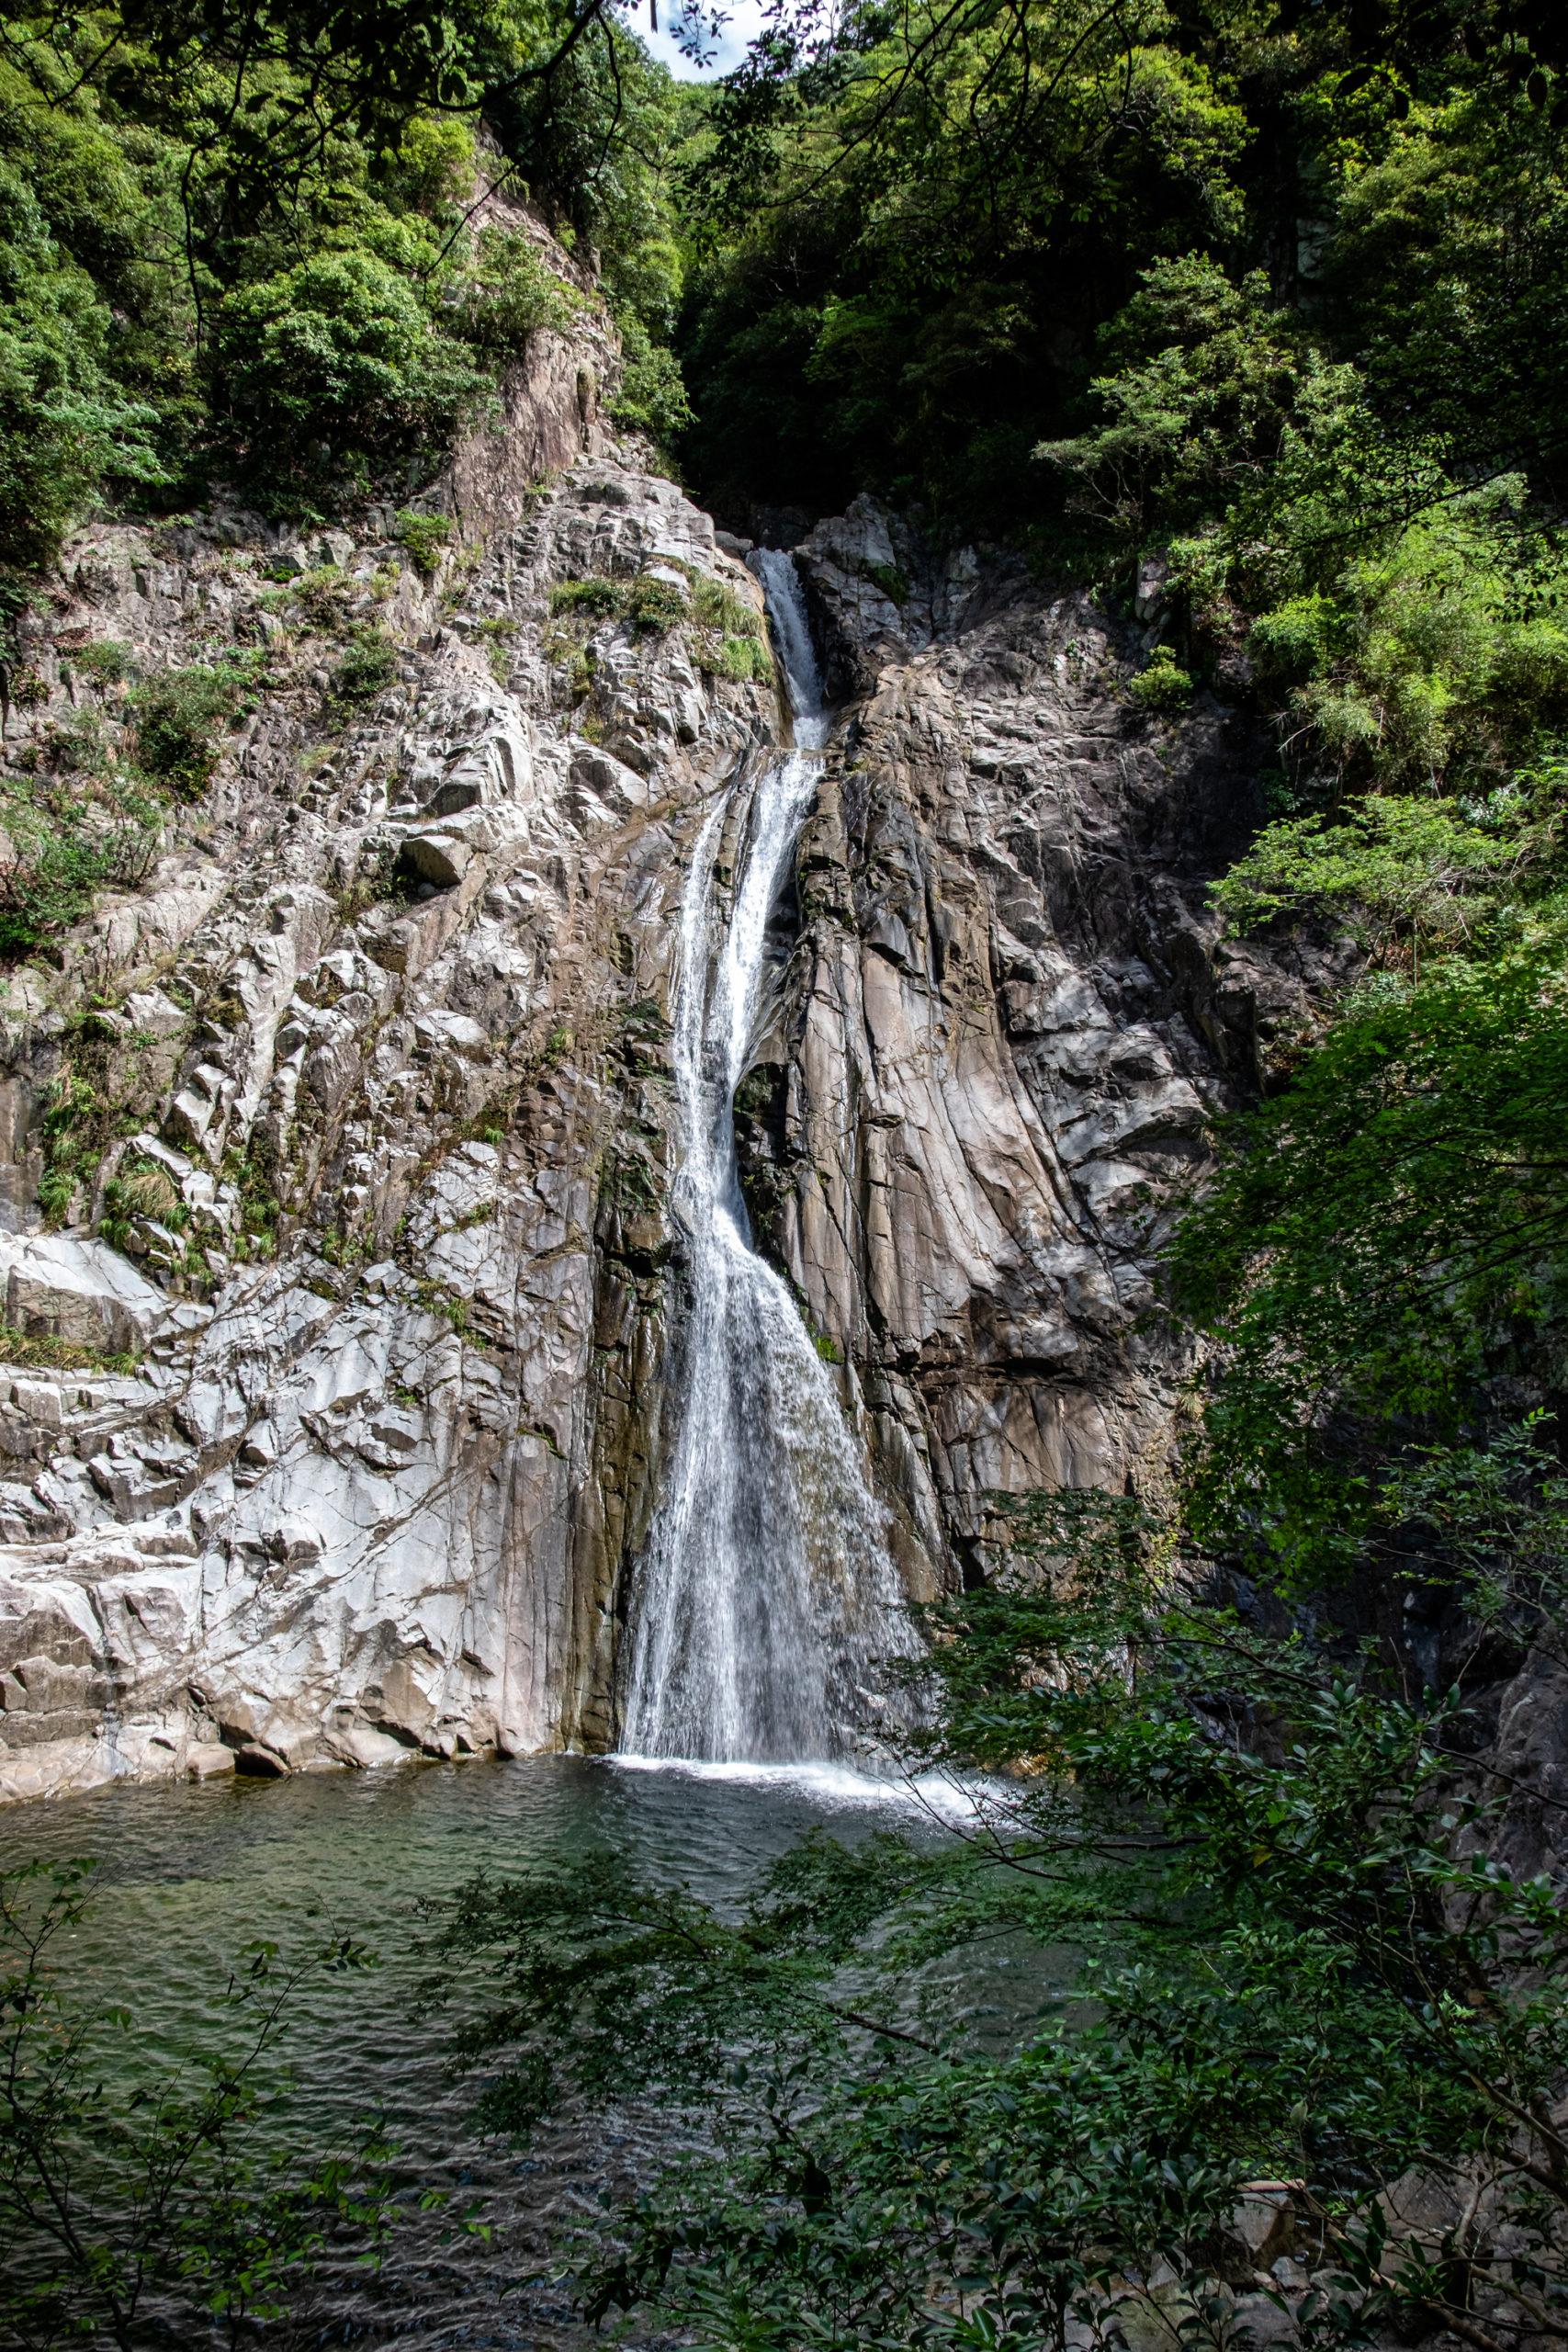 DSCF7158-scaled 兵庫県 布引の滝(新神戸駅から手軽にアクセスできる日本の滝百選の滝スポット! 撮影した写真の紹介、滝までのアクセス情報など)